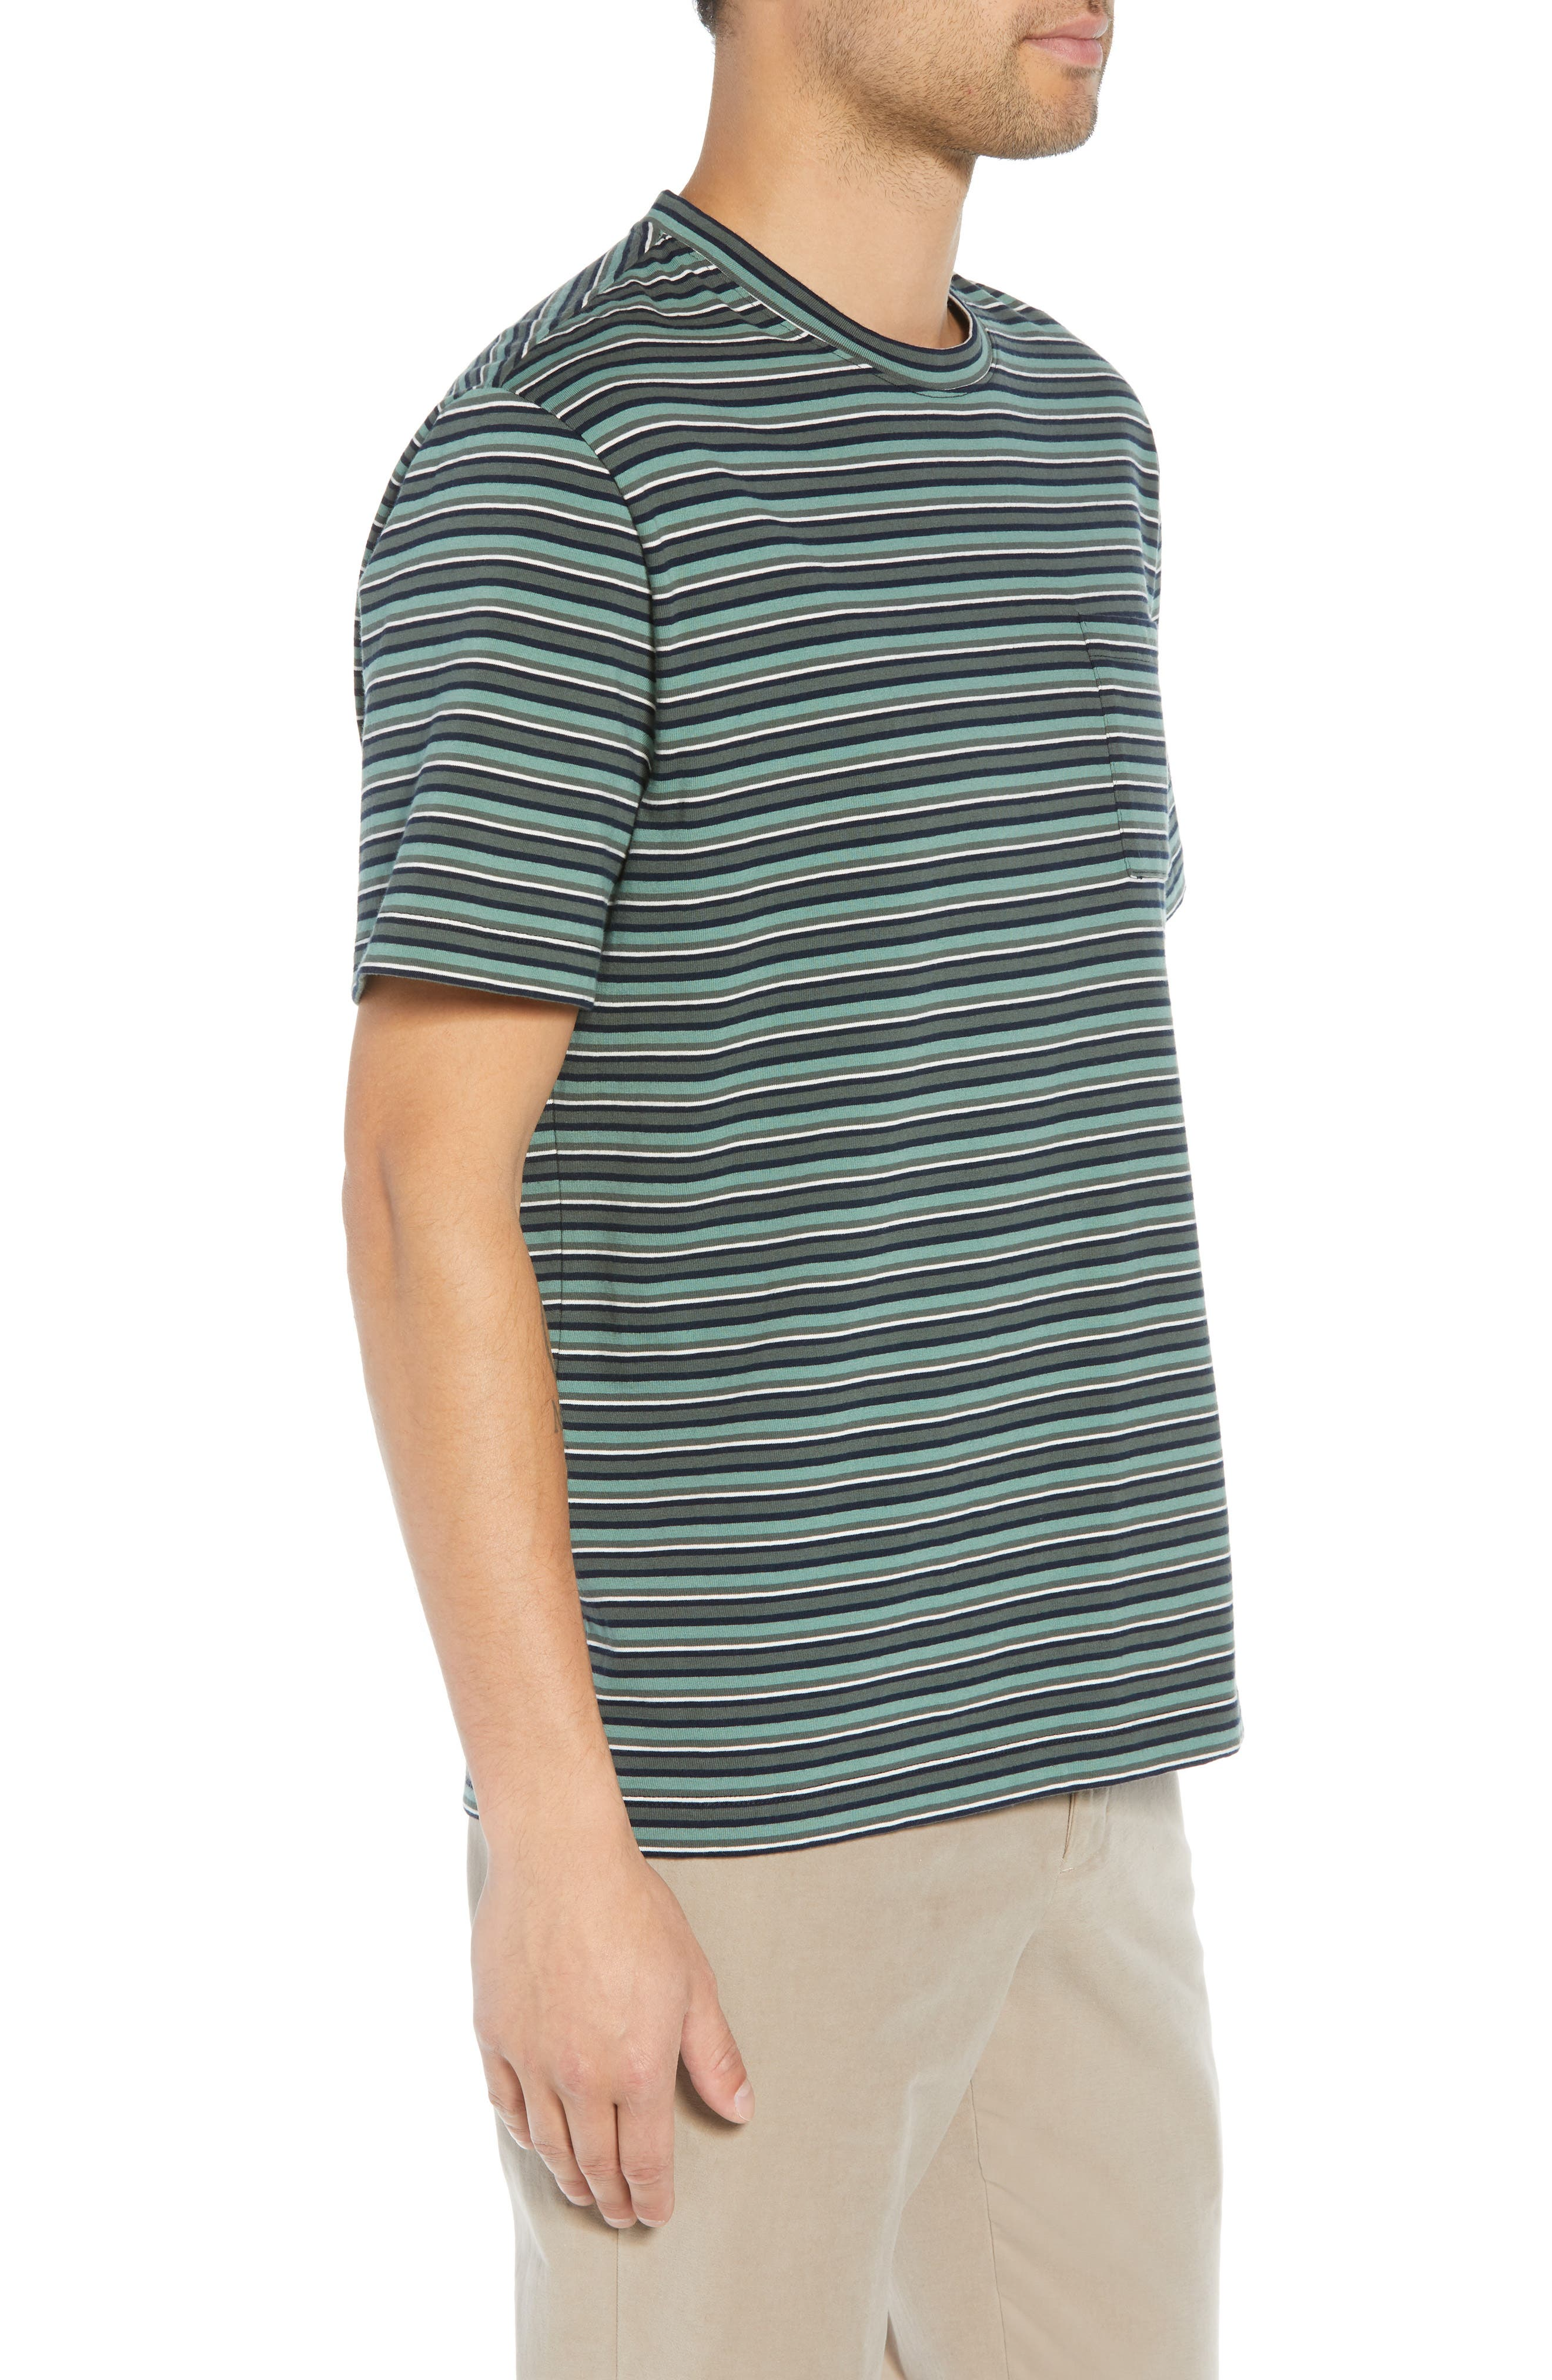 Regular Fit Multistripe Pocket T-Shirt,                             Alternate thumbnail 3, color,                             URBAN GREEN/ SPEARMINT